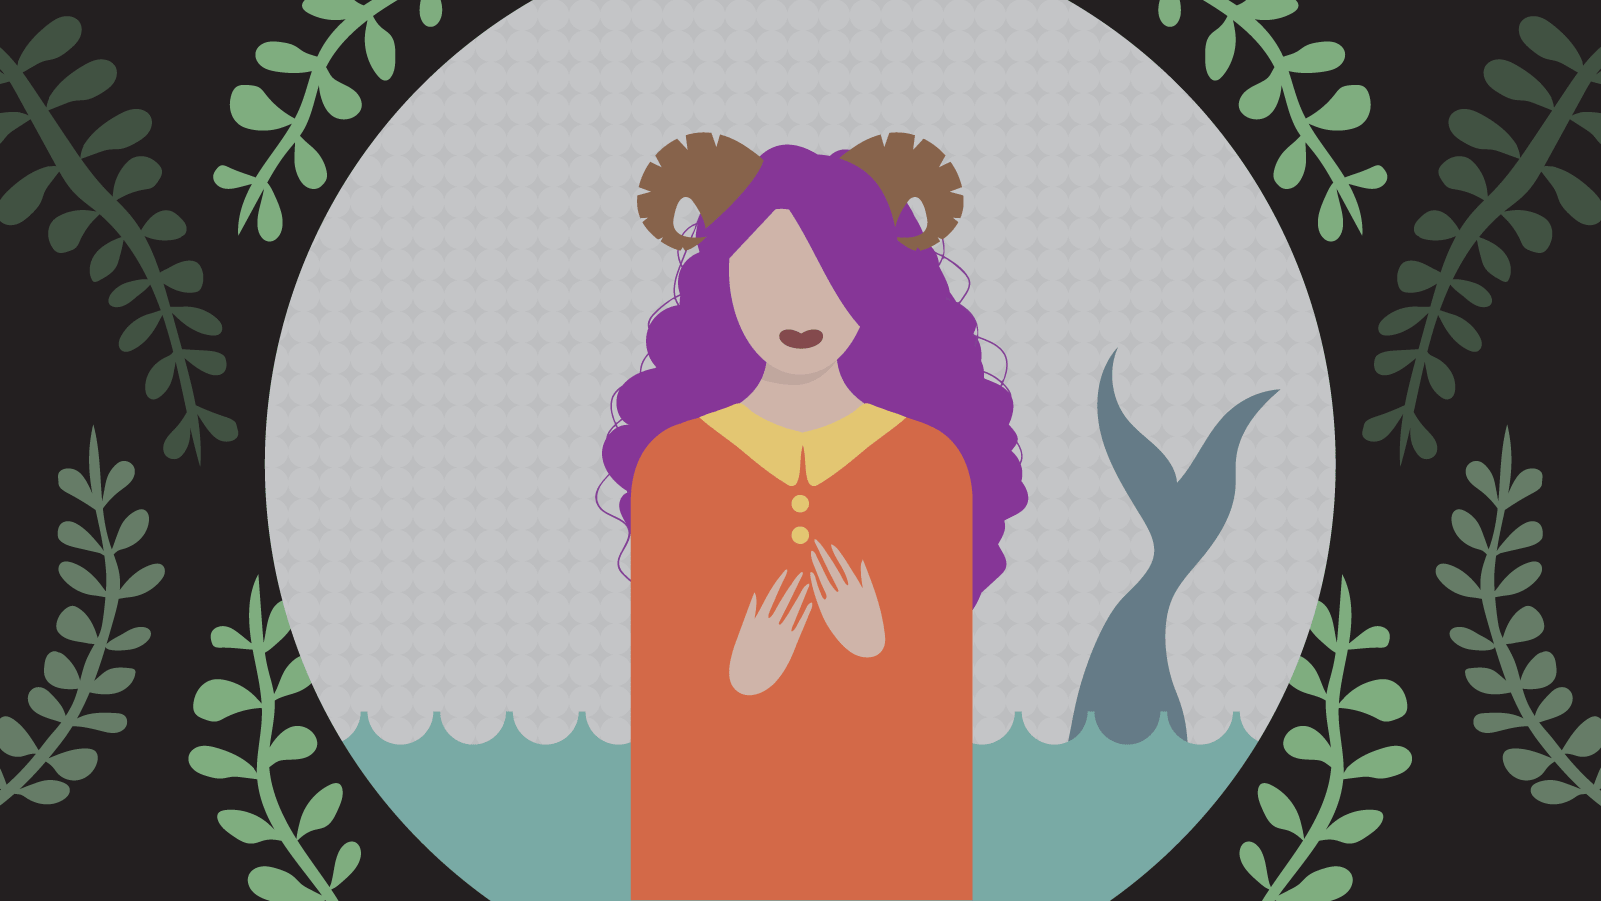 capricorn-horoscope.png